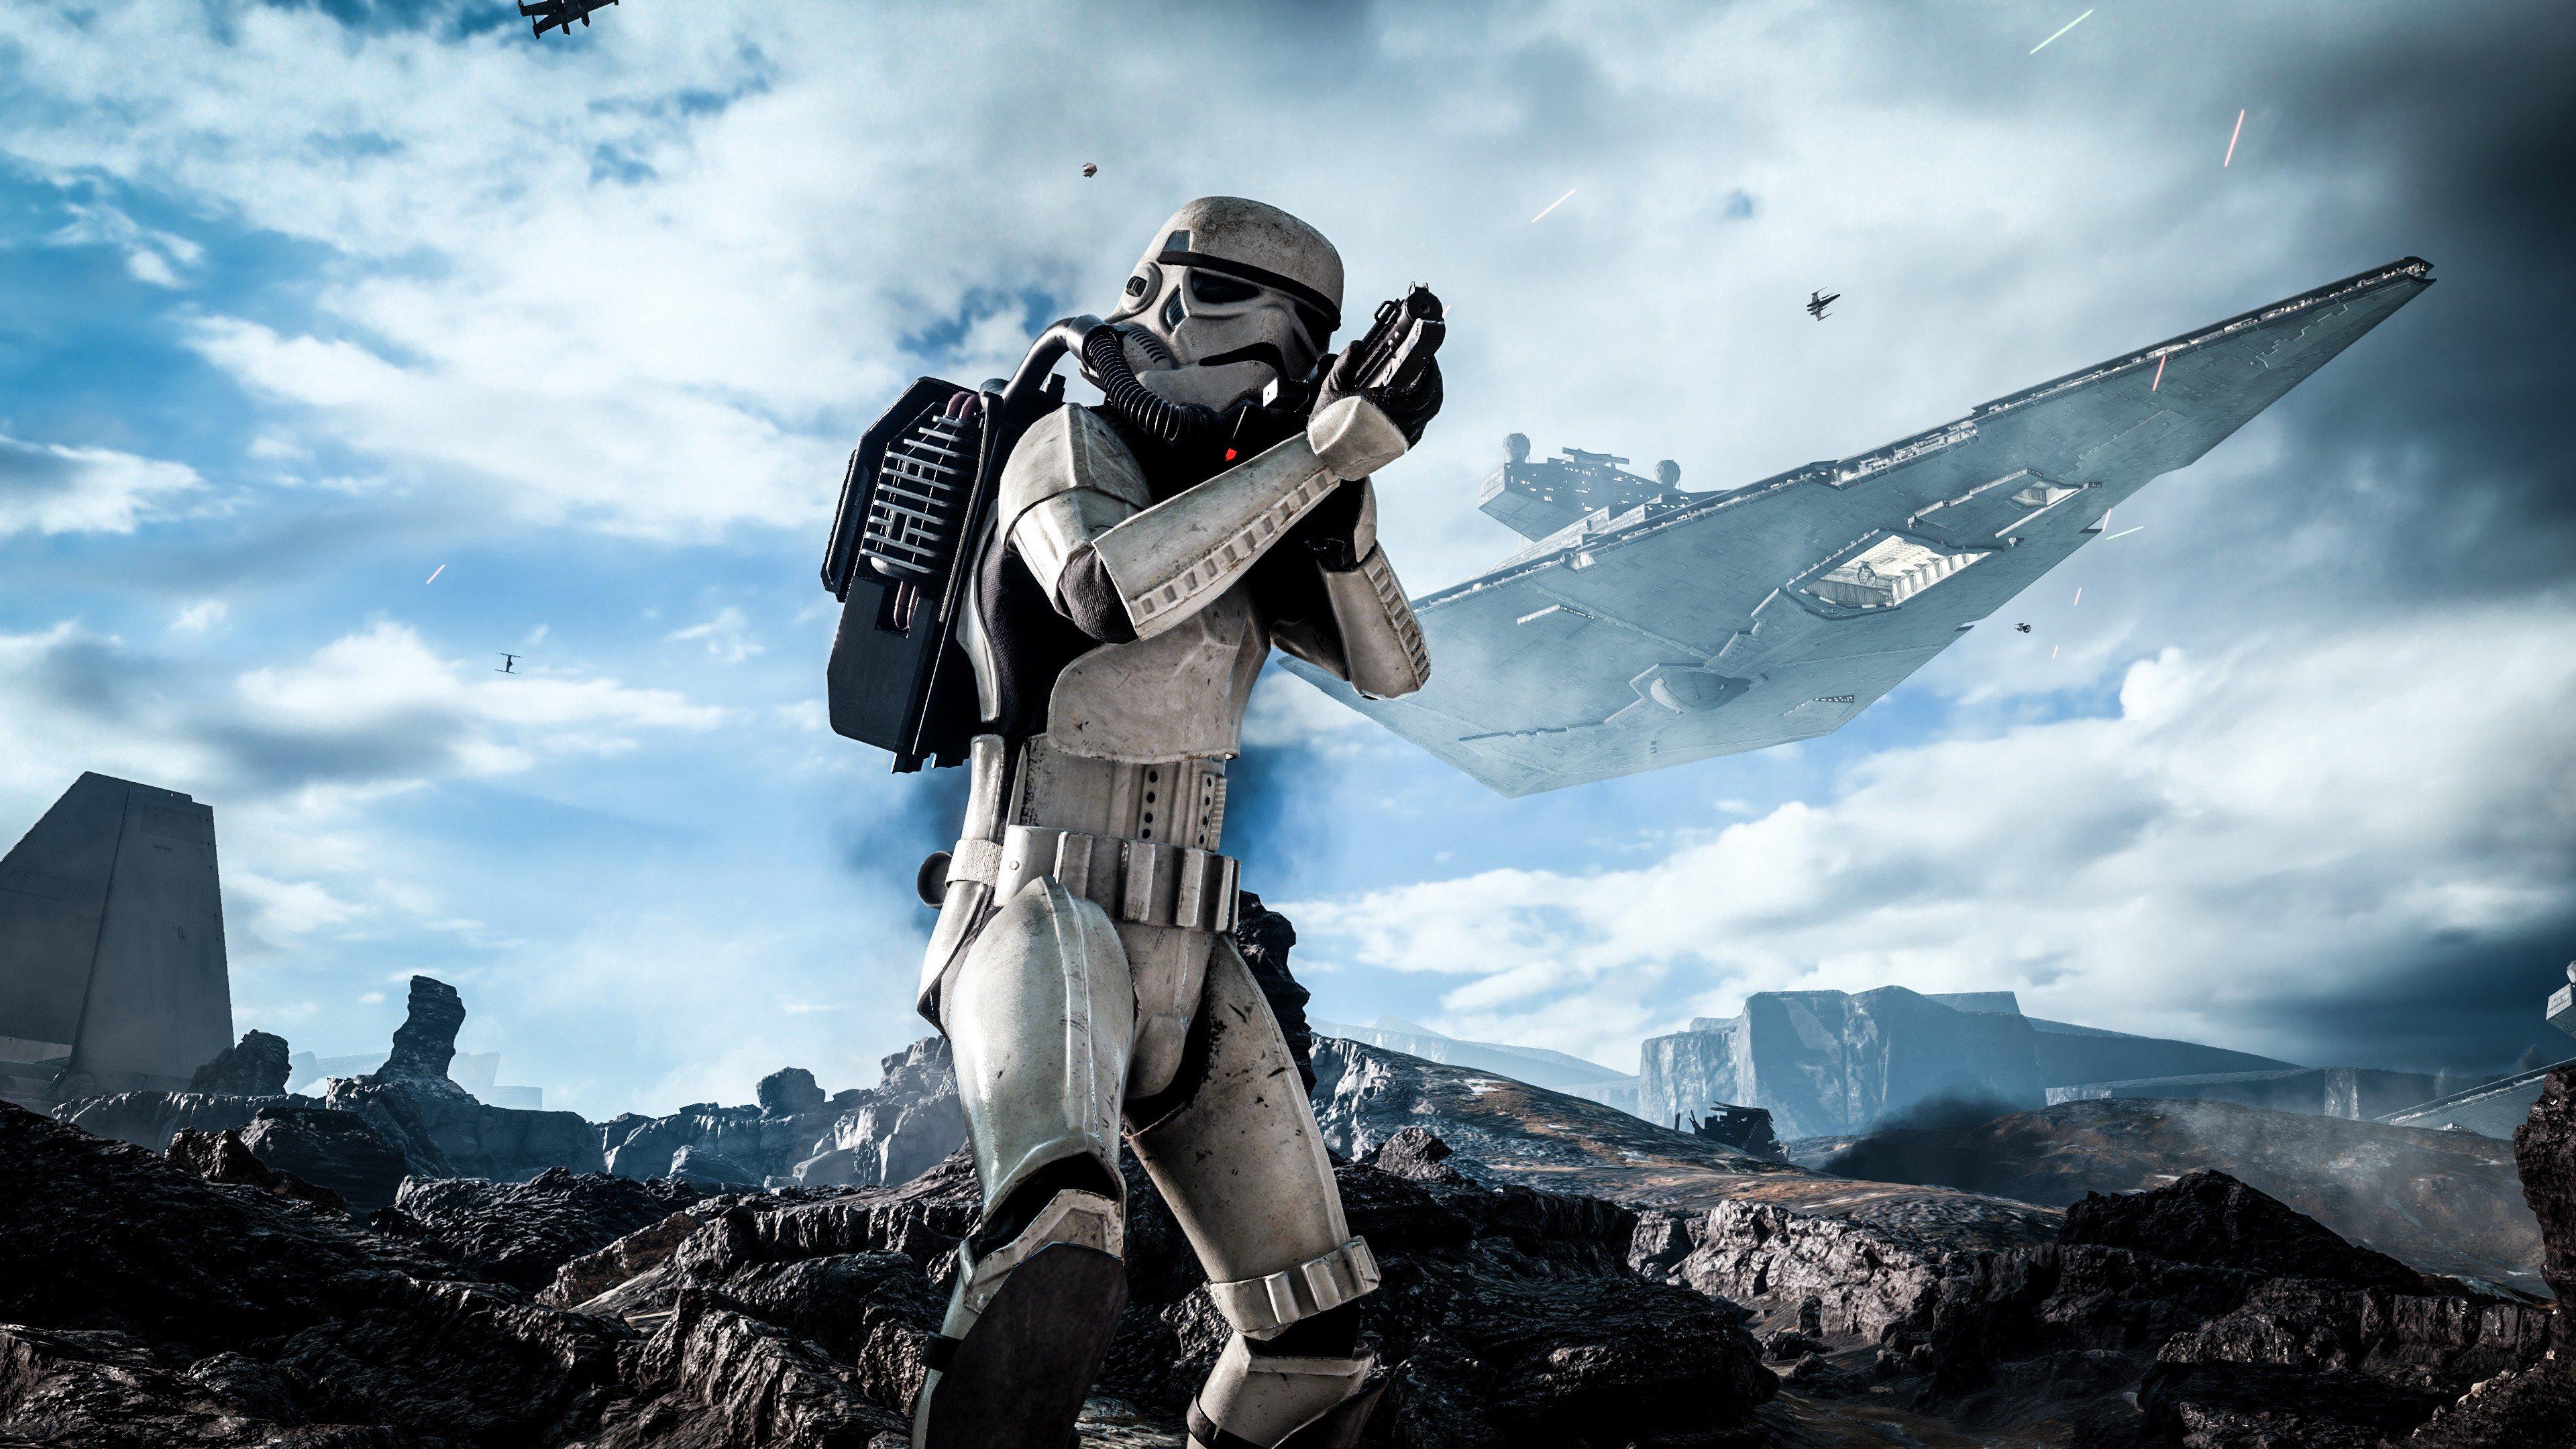 Stormtrooper In Star Wars, HD Movies, 4k Wallpapers ...